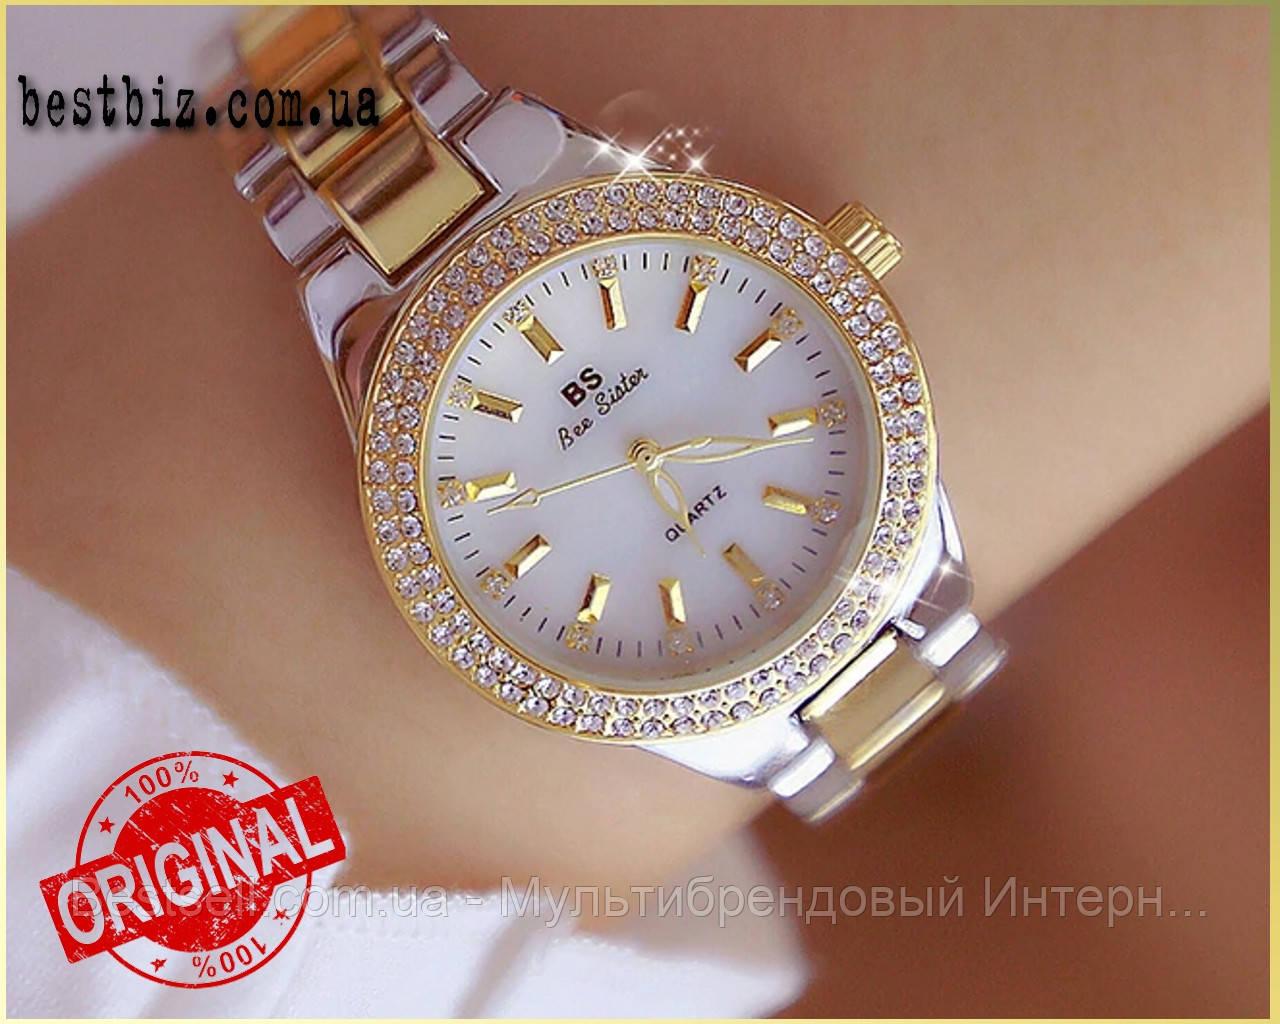 Женские часы кварцевые оригинал Bee Sister 1258 Gold-Silver-White Diamonds (видеообзор в описании)